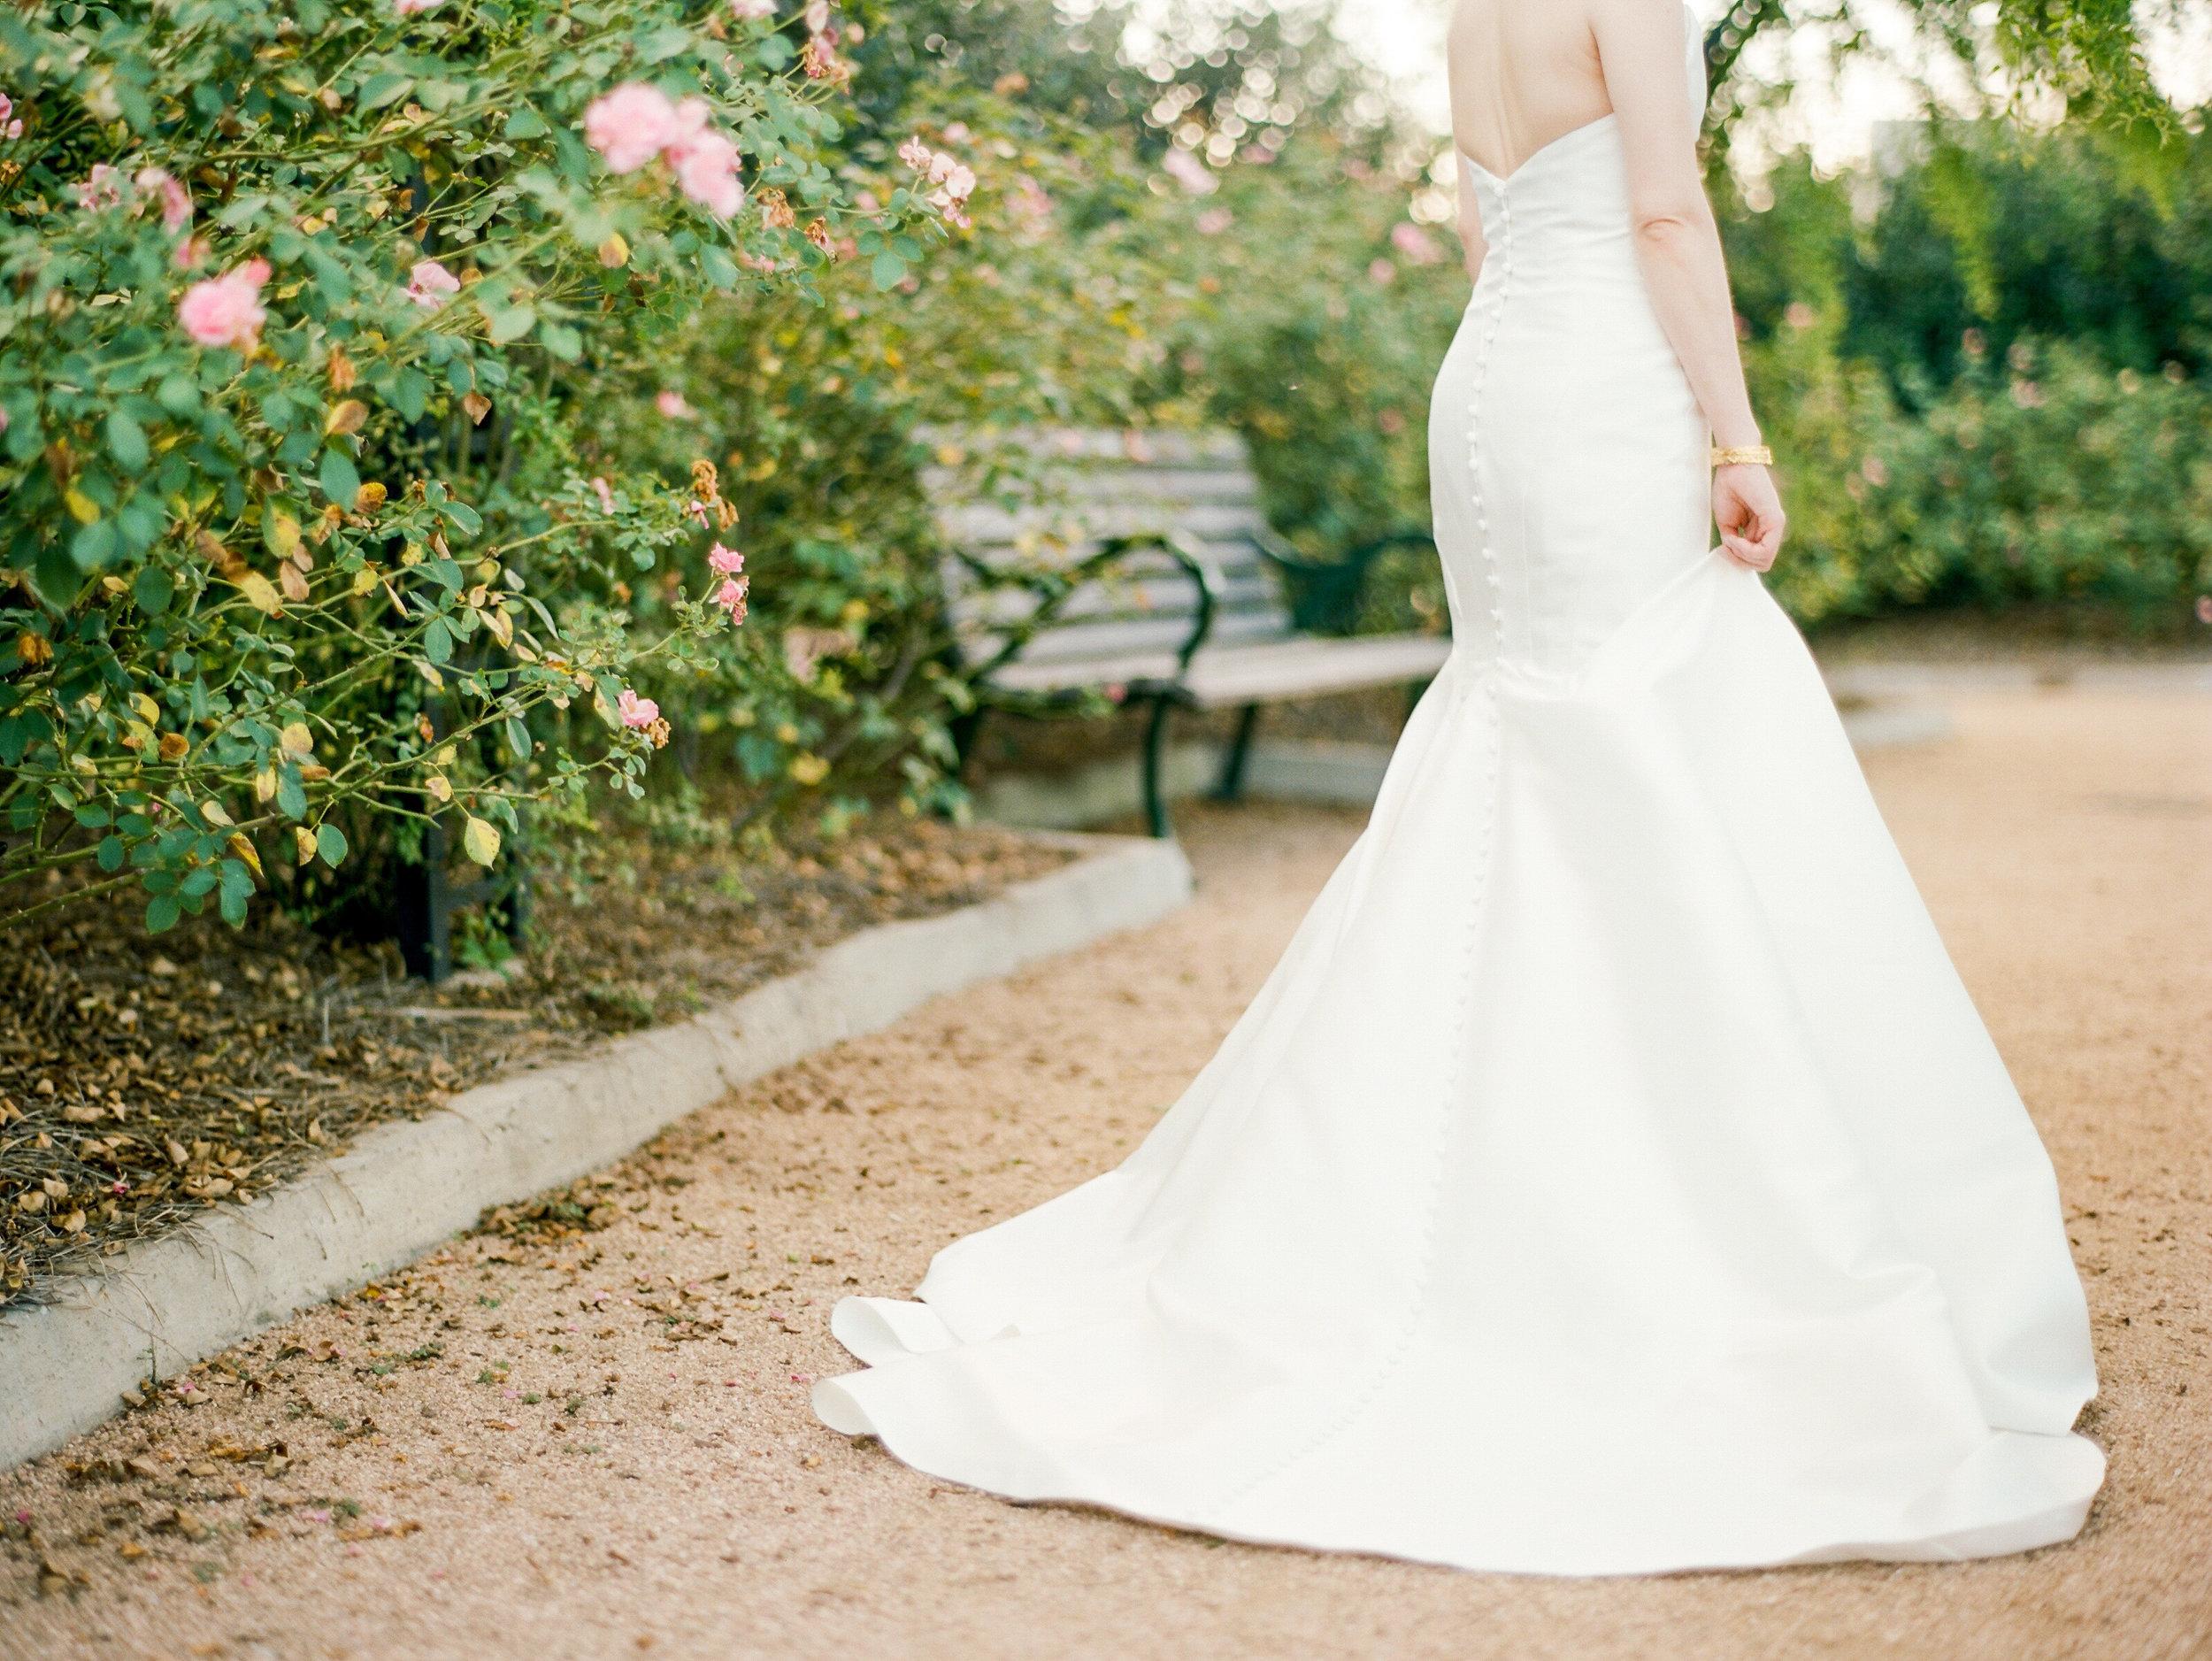 mcgovern-centennial-gardens-wedding-houston-wedding-photographer-bridals-film-austin-wedding-photographer-4.jpg